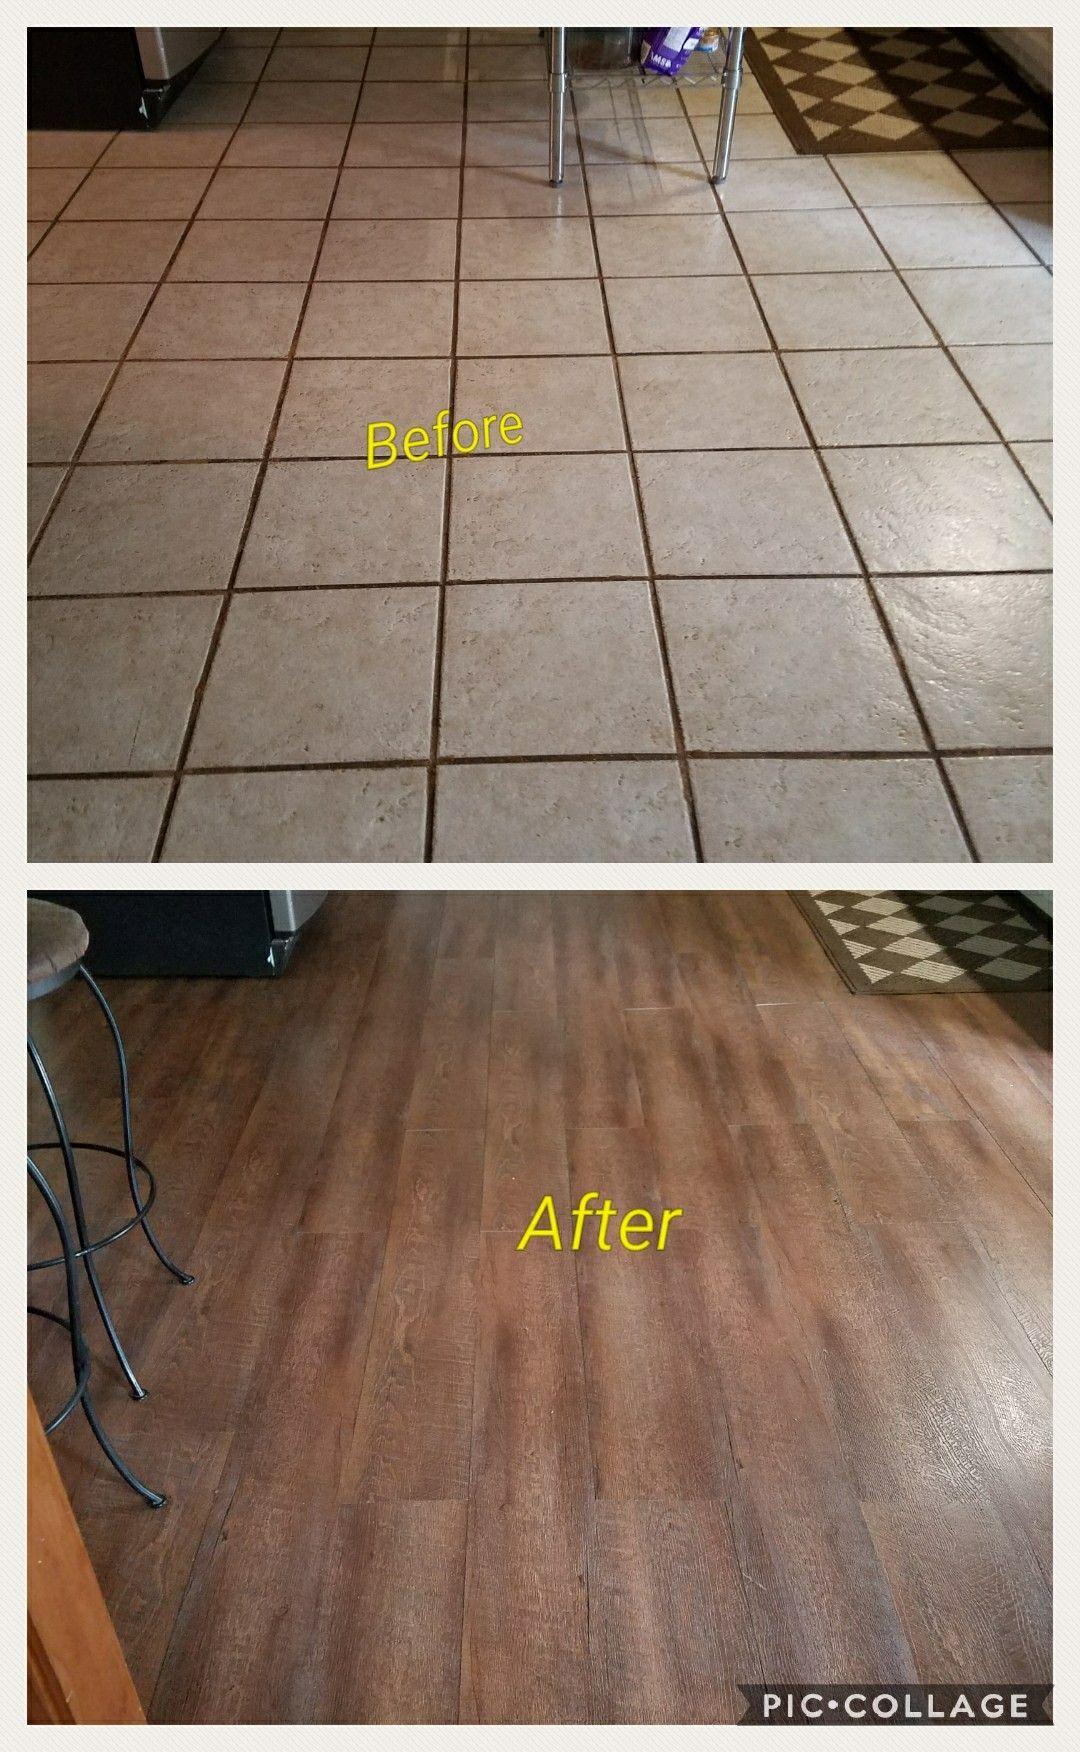 We Put Down Vinyl Plank Flooring Over Tile We Did Use A Bag Of Self Leve Vinyl Plank Flooring Luxury Vinyl Plank Flooring Kitchen Vinyl Plank Flooring Kitchen